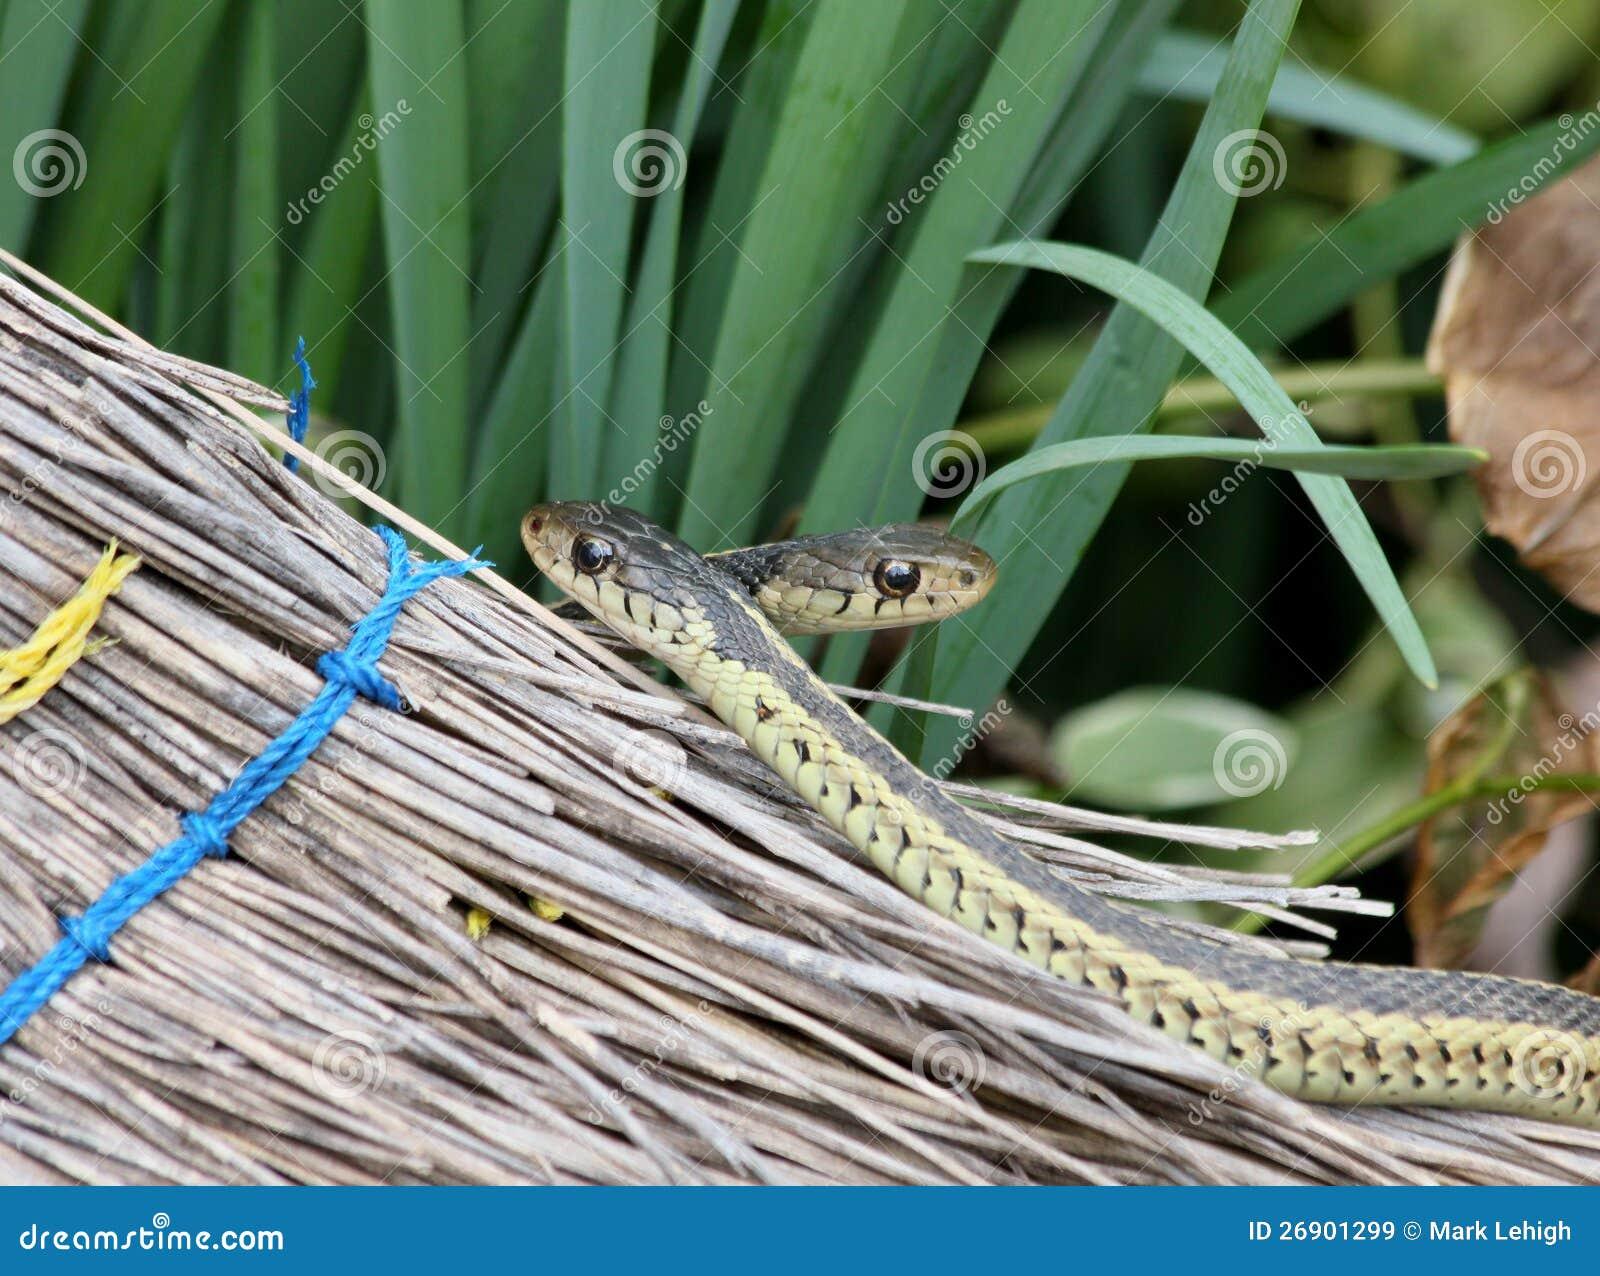 Download Garter snakes and broom stock image. Image of animal - 26901299